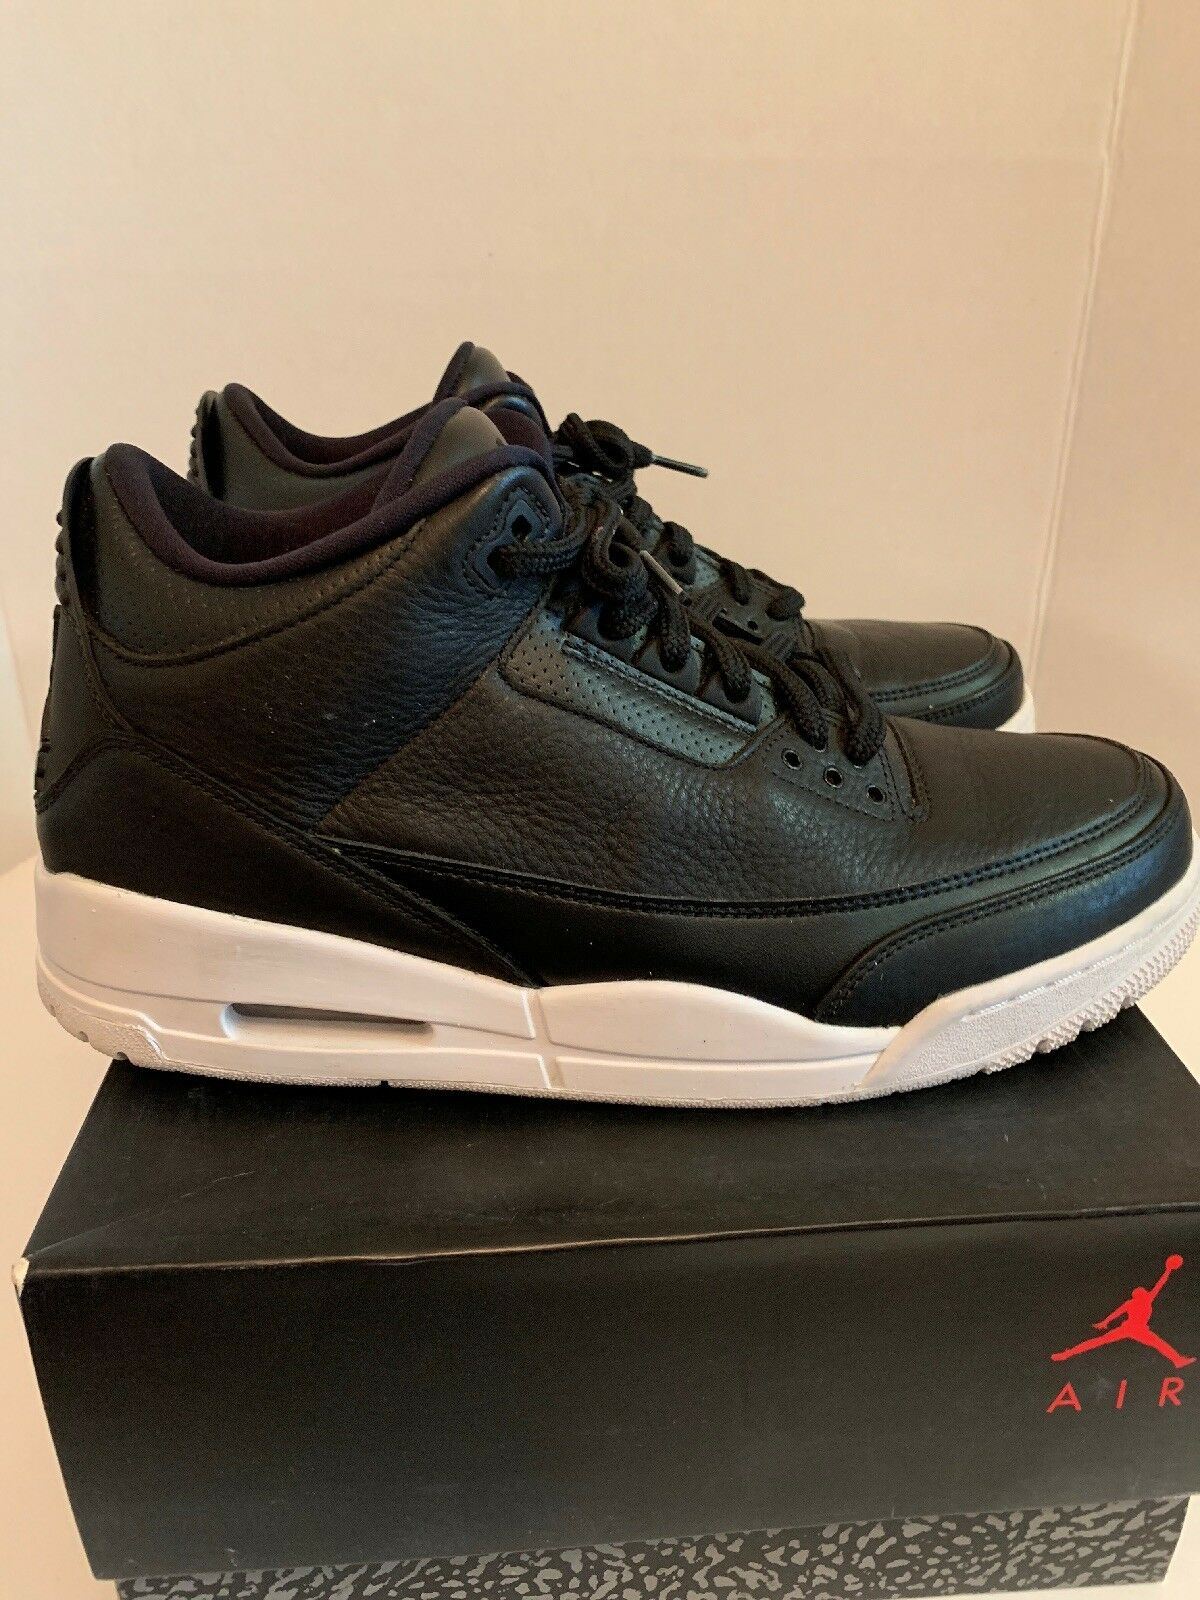 07593edd170 USED MENS NIKE AIR JORDAN III 3 CYBER 136064 020 SZ 10.5 NOBOX FREE MONDAY  BLACK ntkwqs6182-Athletic Shoes